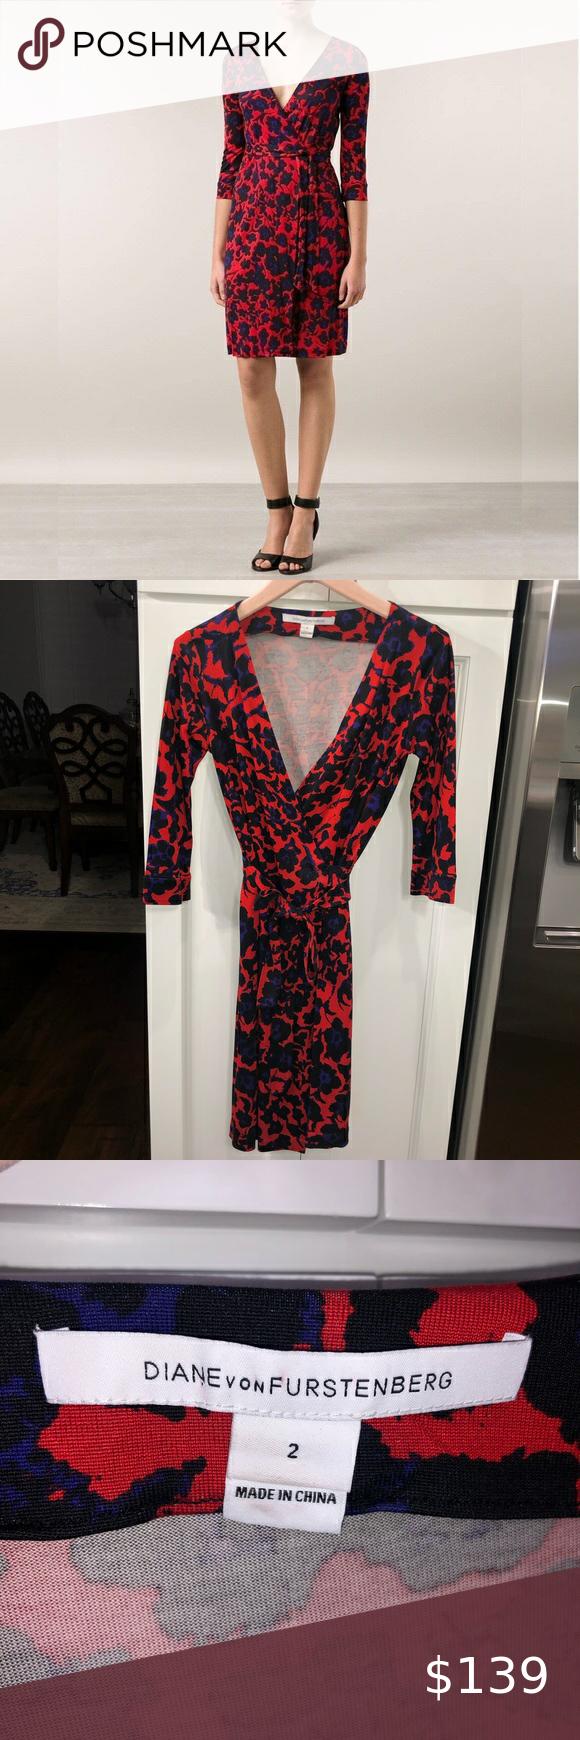 Size 2 Diane Von Furstenberg Wrap Dress Dvf Wrap Dress Clothes Design Printed Wrap Dresses [ 1740 x 580 Pixel ]